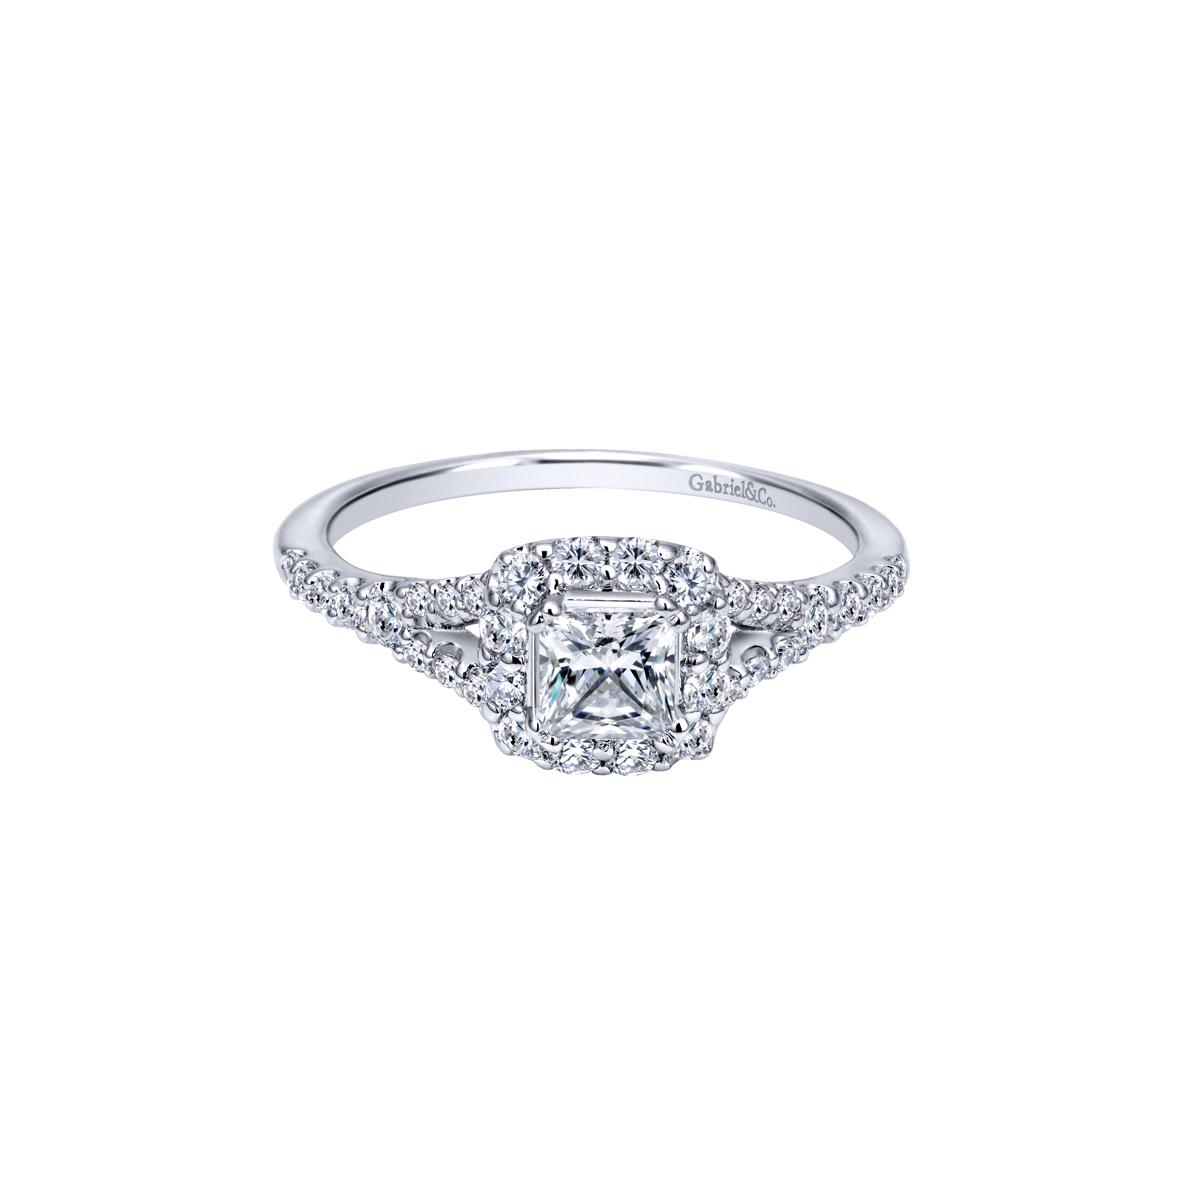 14k White Gold Princess Cut Halo Diamond Engagement Ring Little Treasury